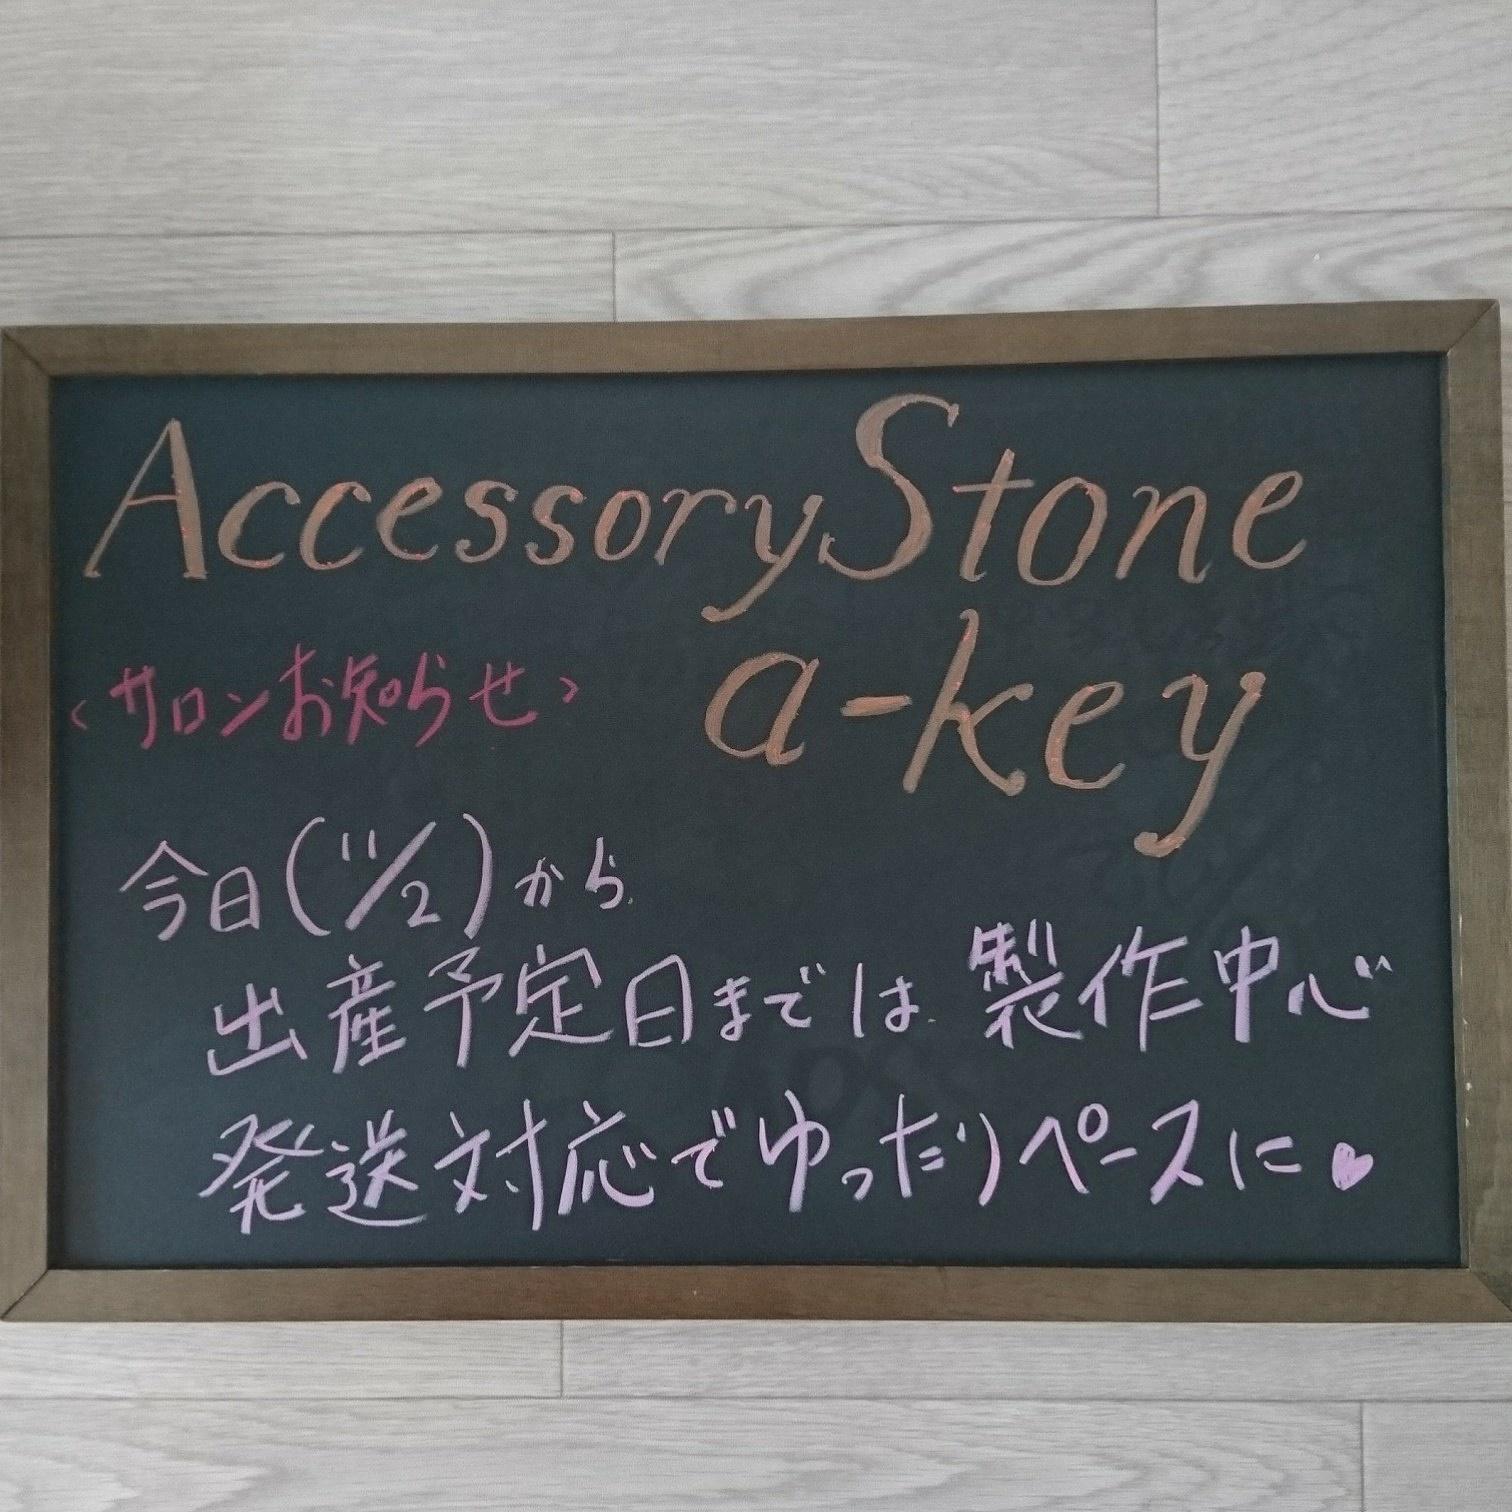 a-keyサロンからのお知らせ